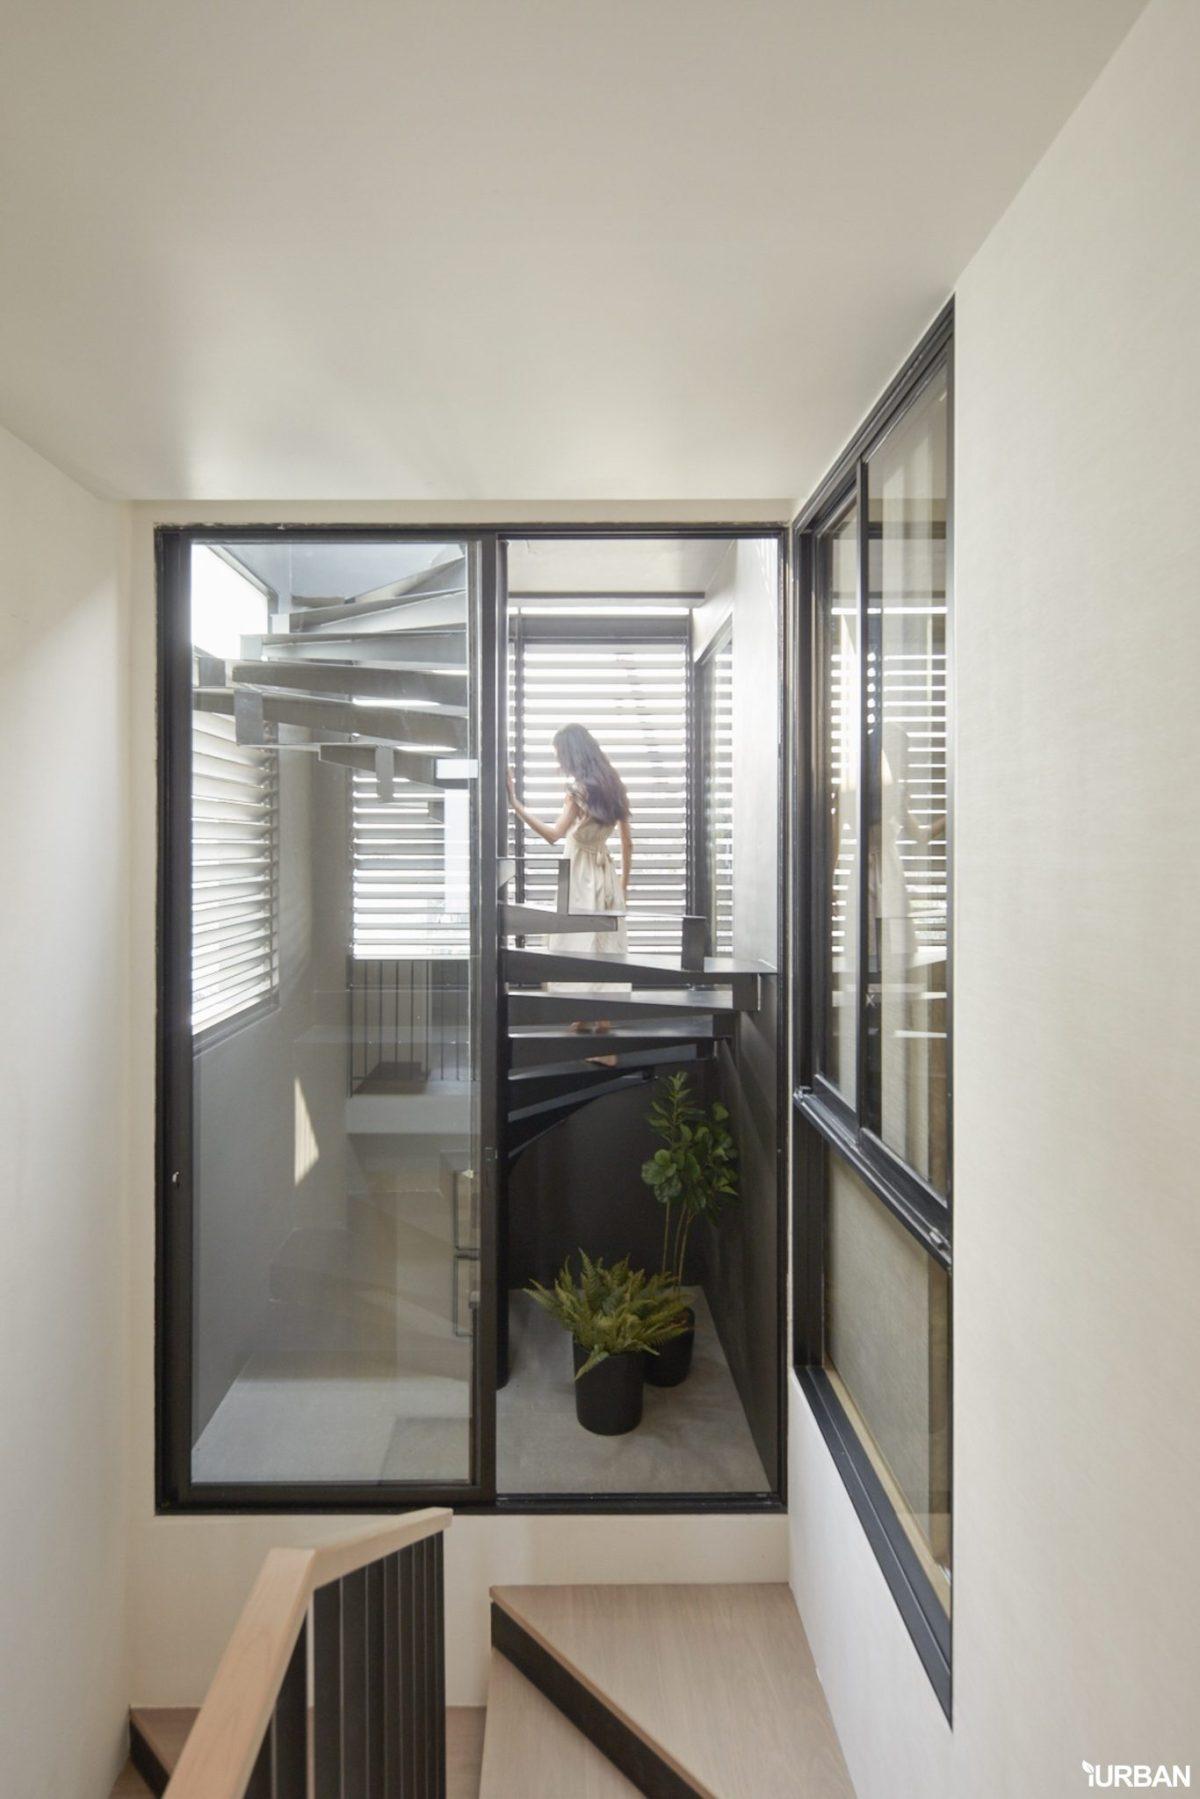 AIRES RAMA9 รีวิว Luxury Townhome 3.5 ชั้น + Rooftop ออกแบบสวย ย่านพระราม9 (ใกล้ รพ.สมิติเวช) 80 - AIRES